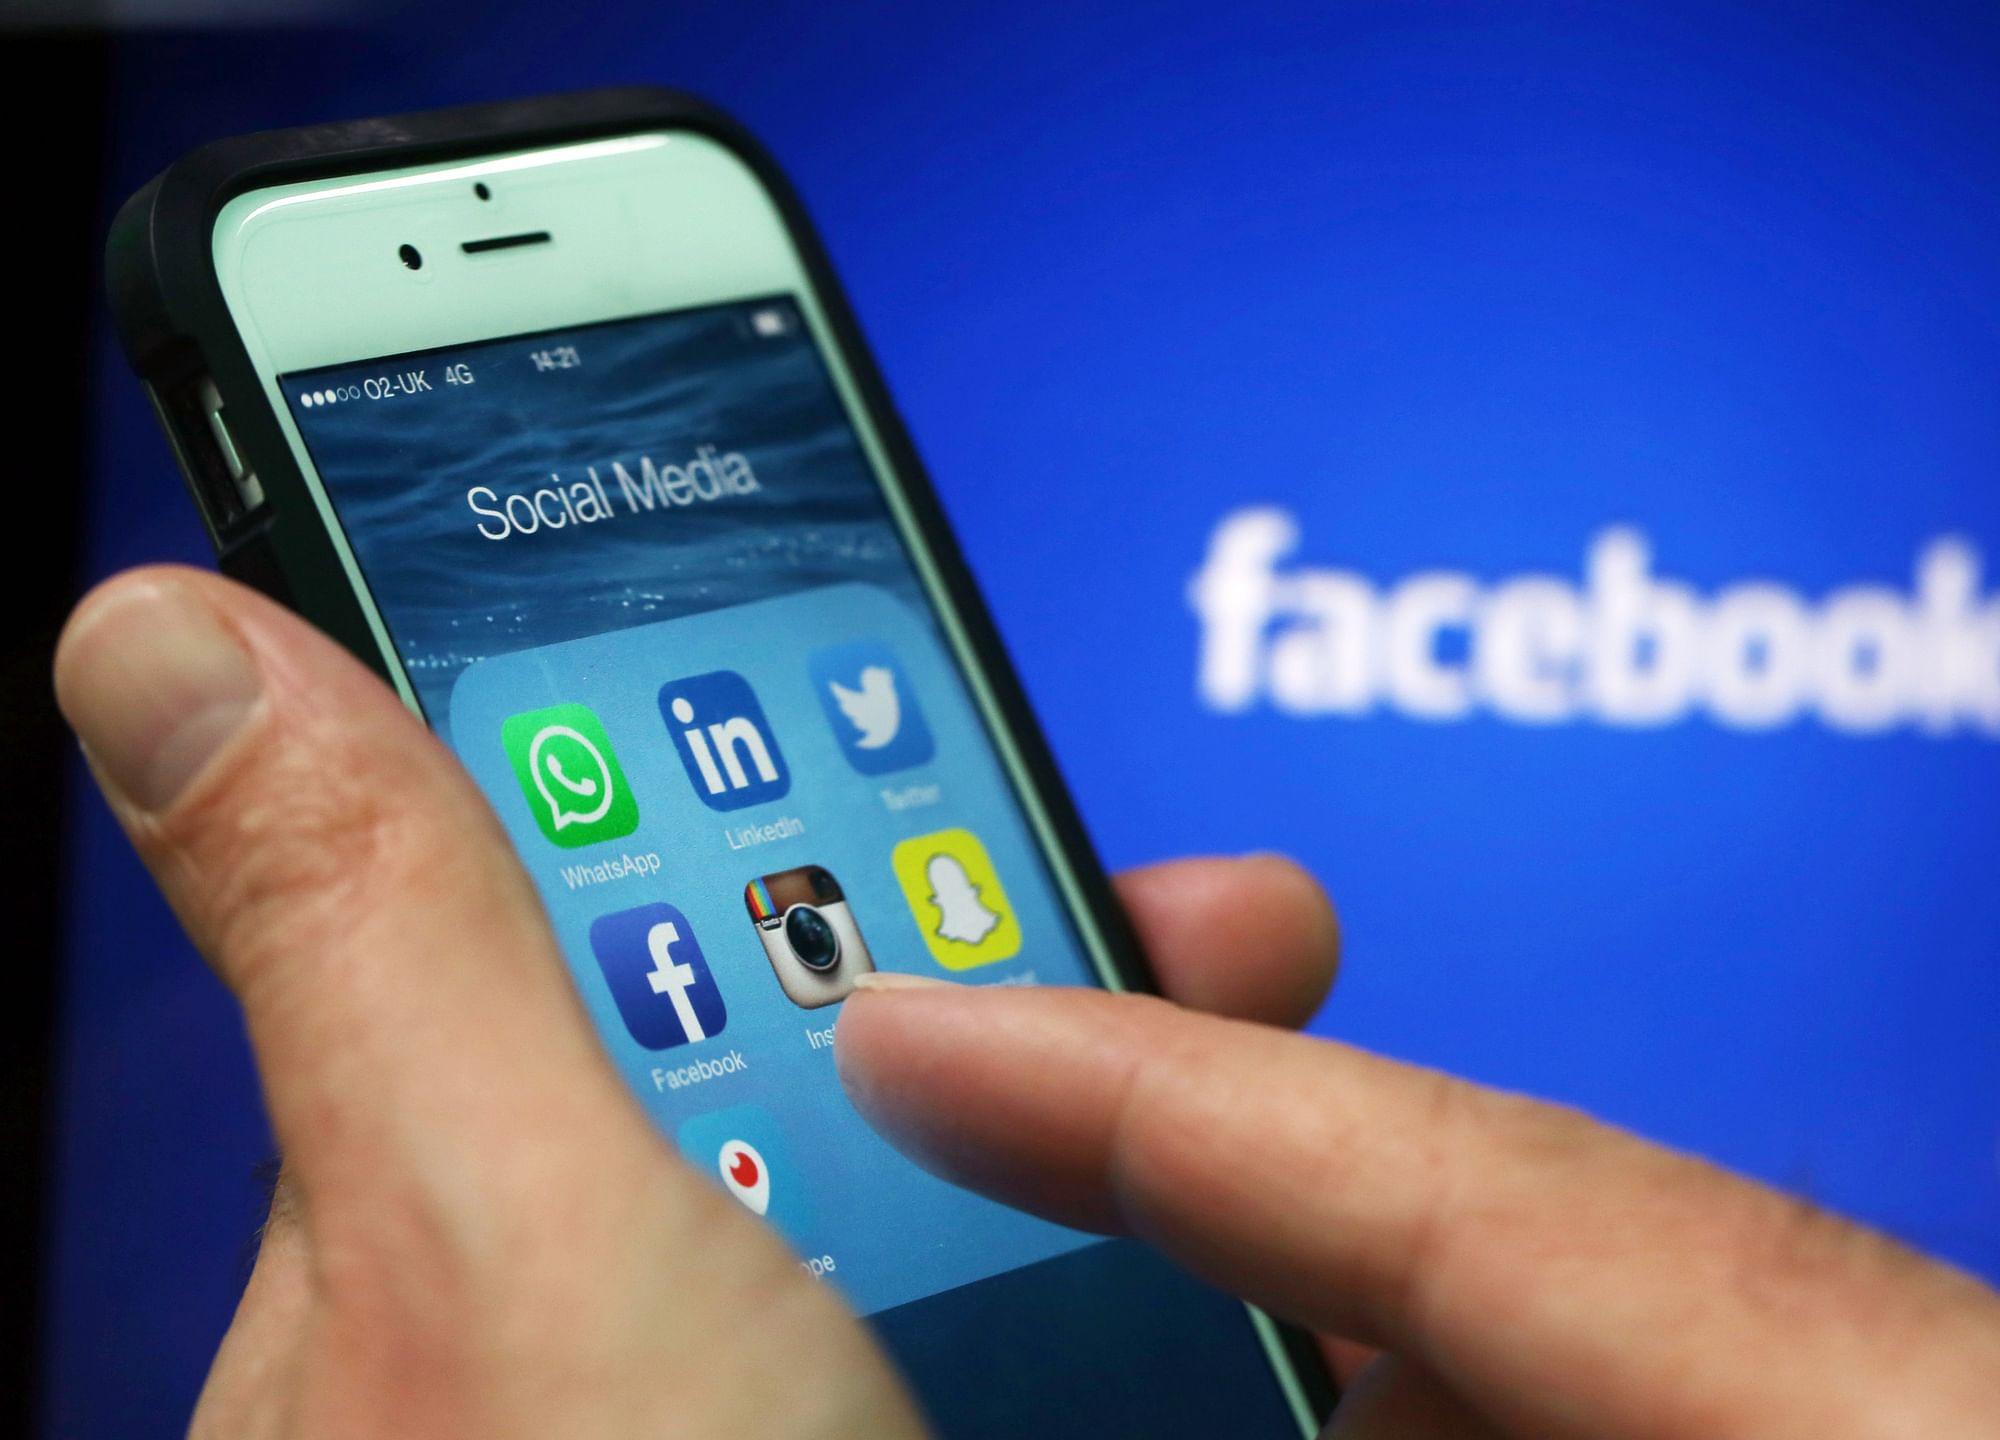 Facebook's stock